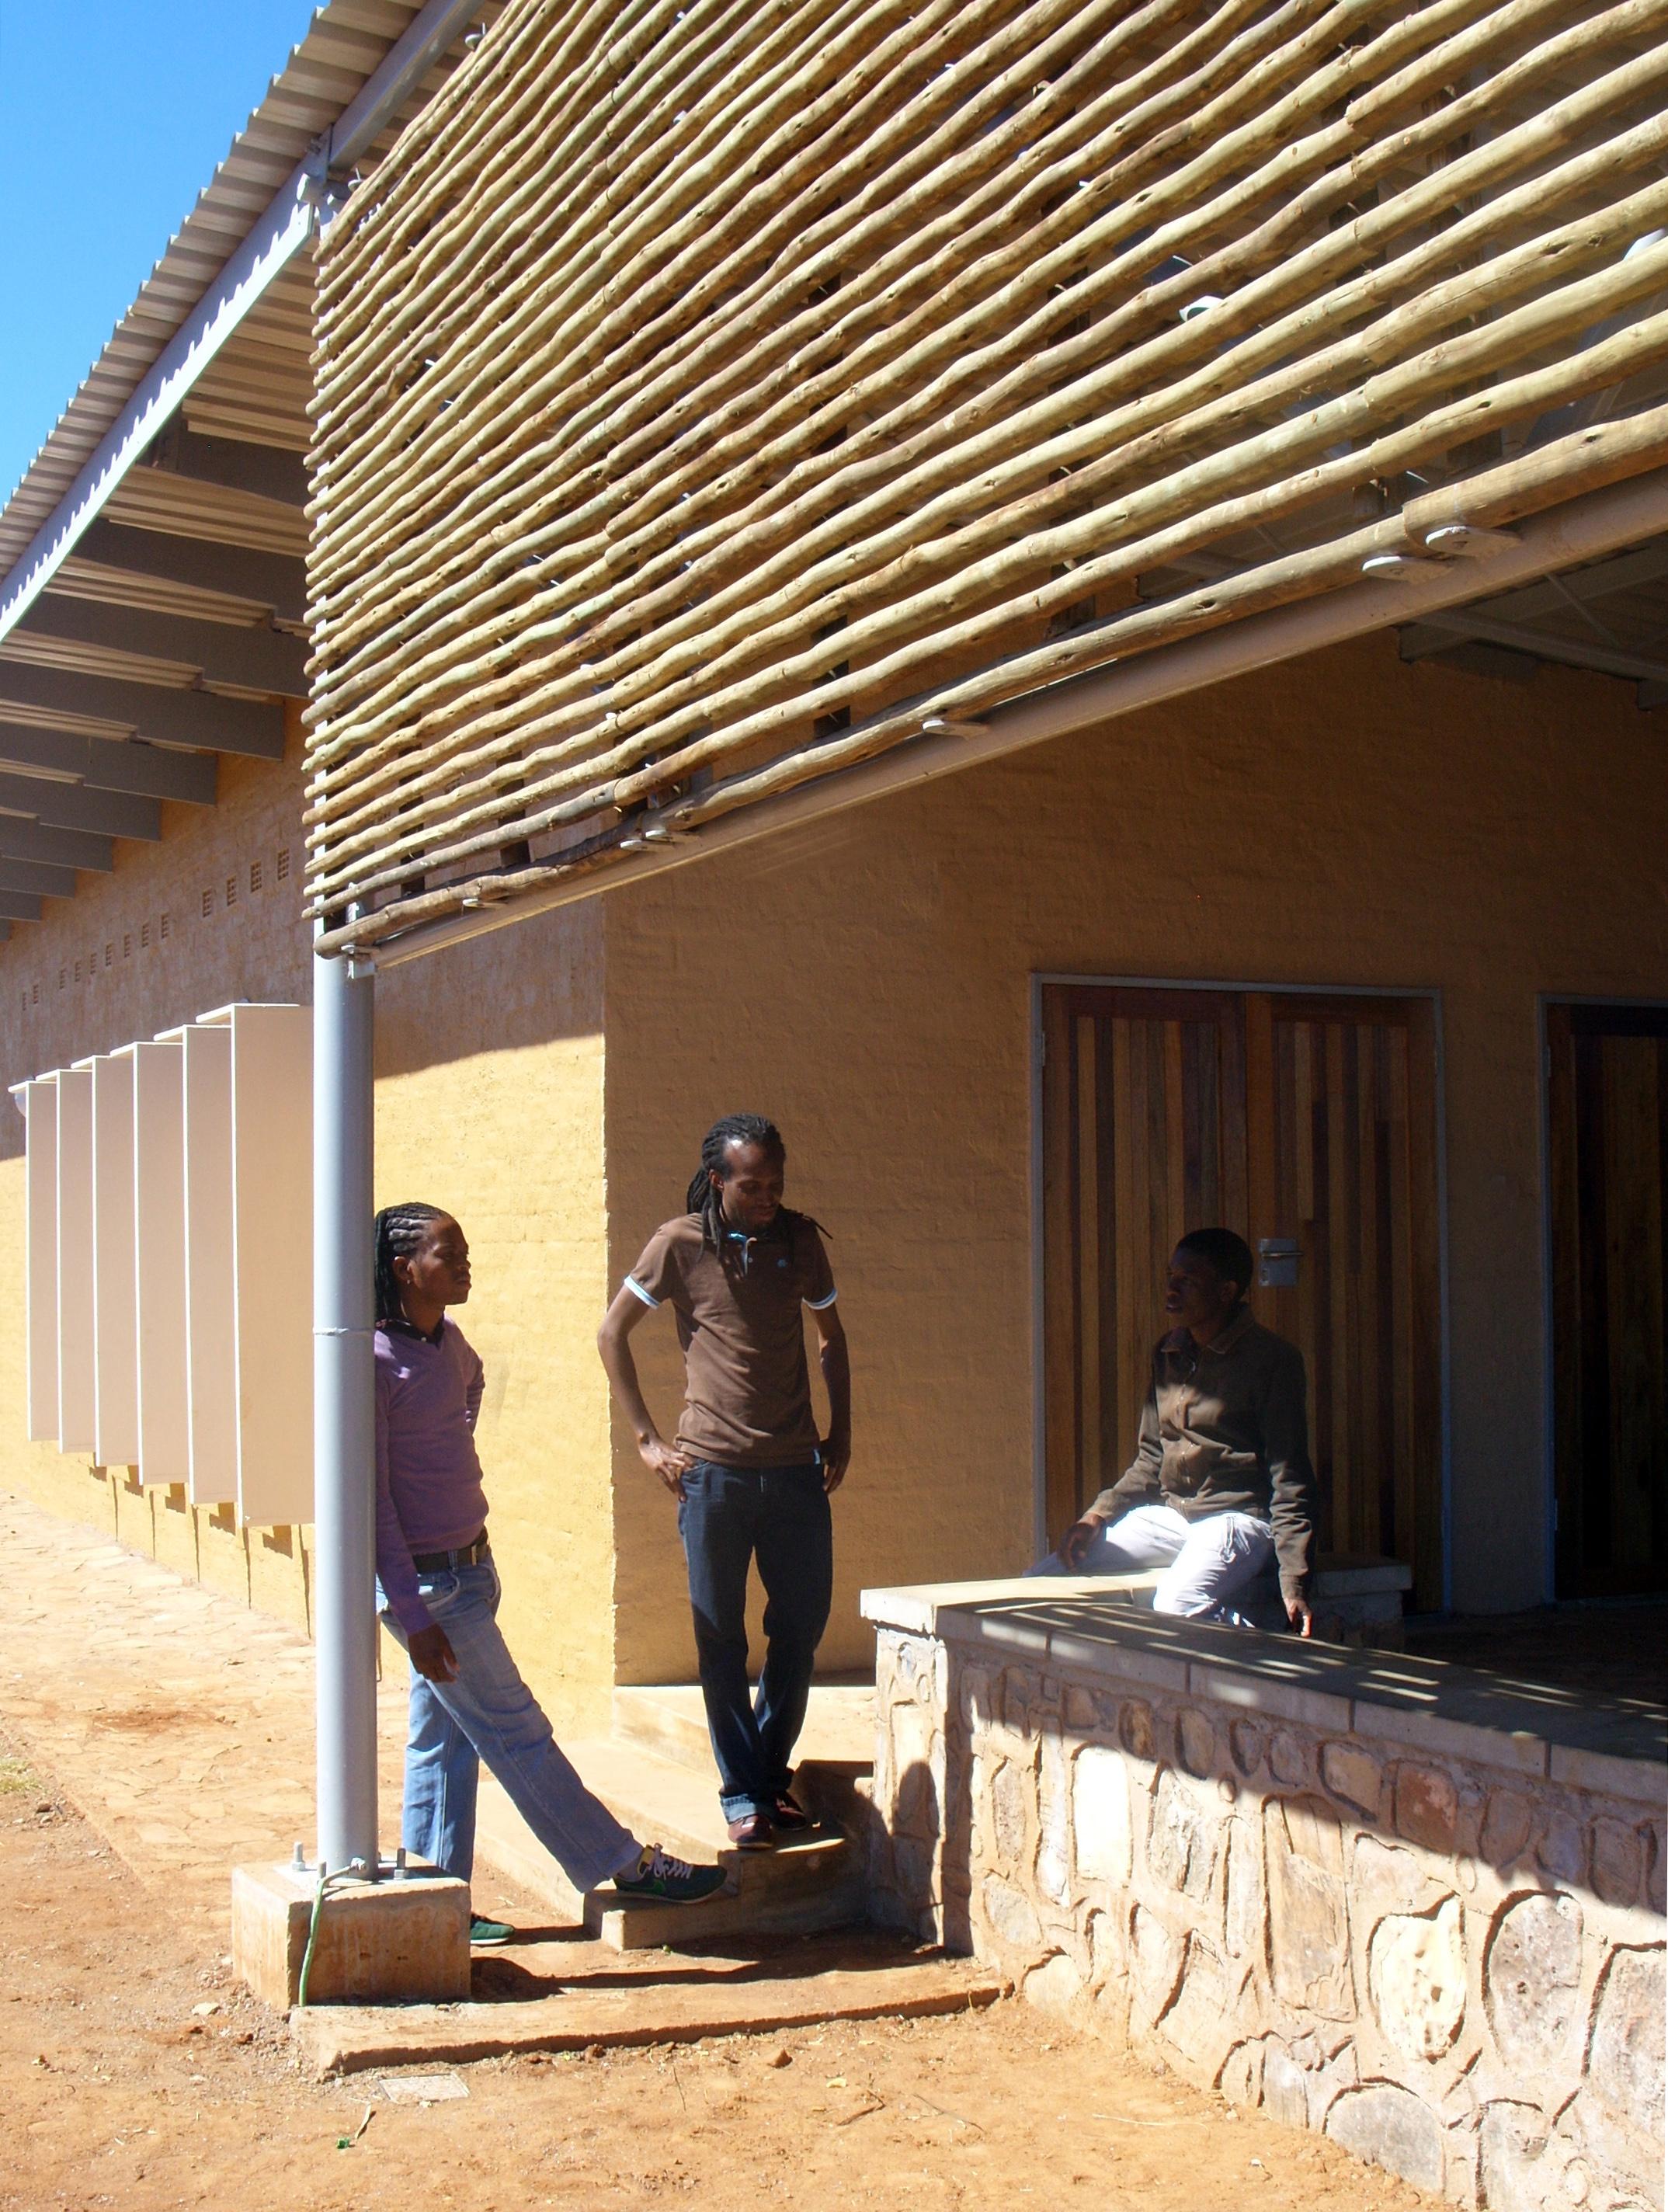 Outdoor seminar space